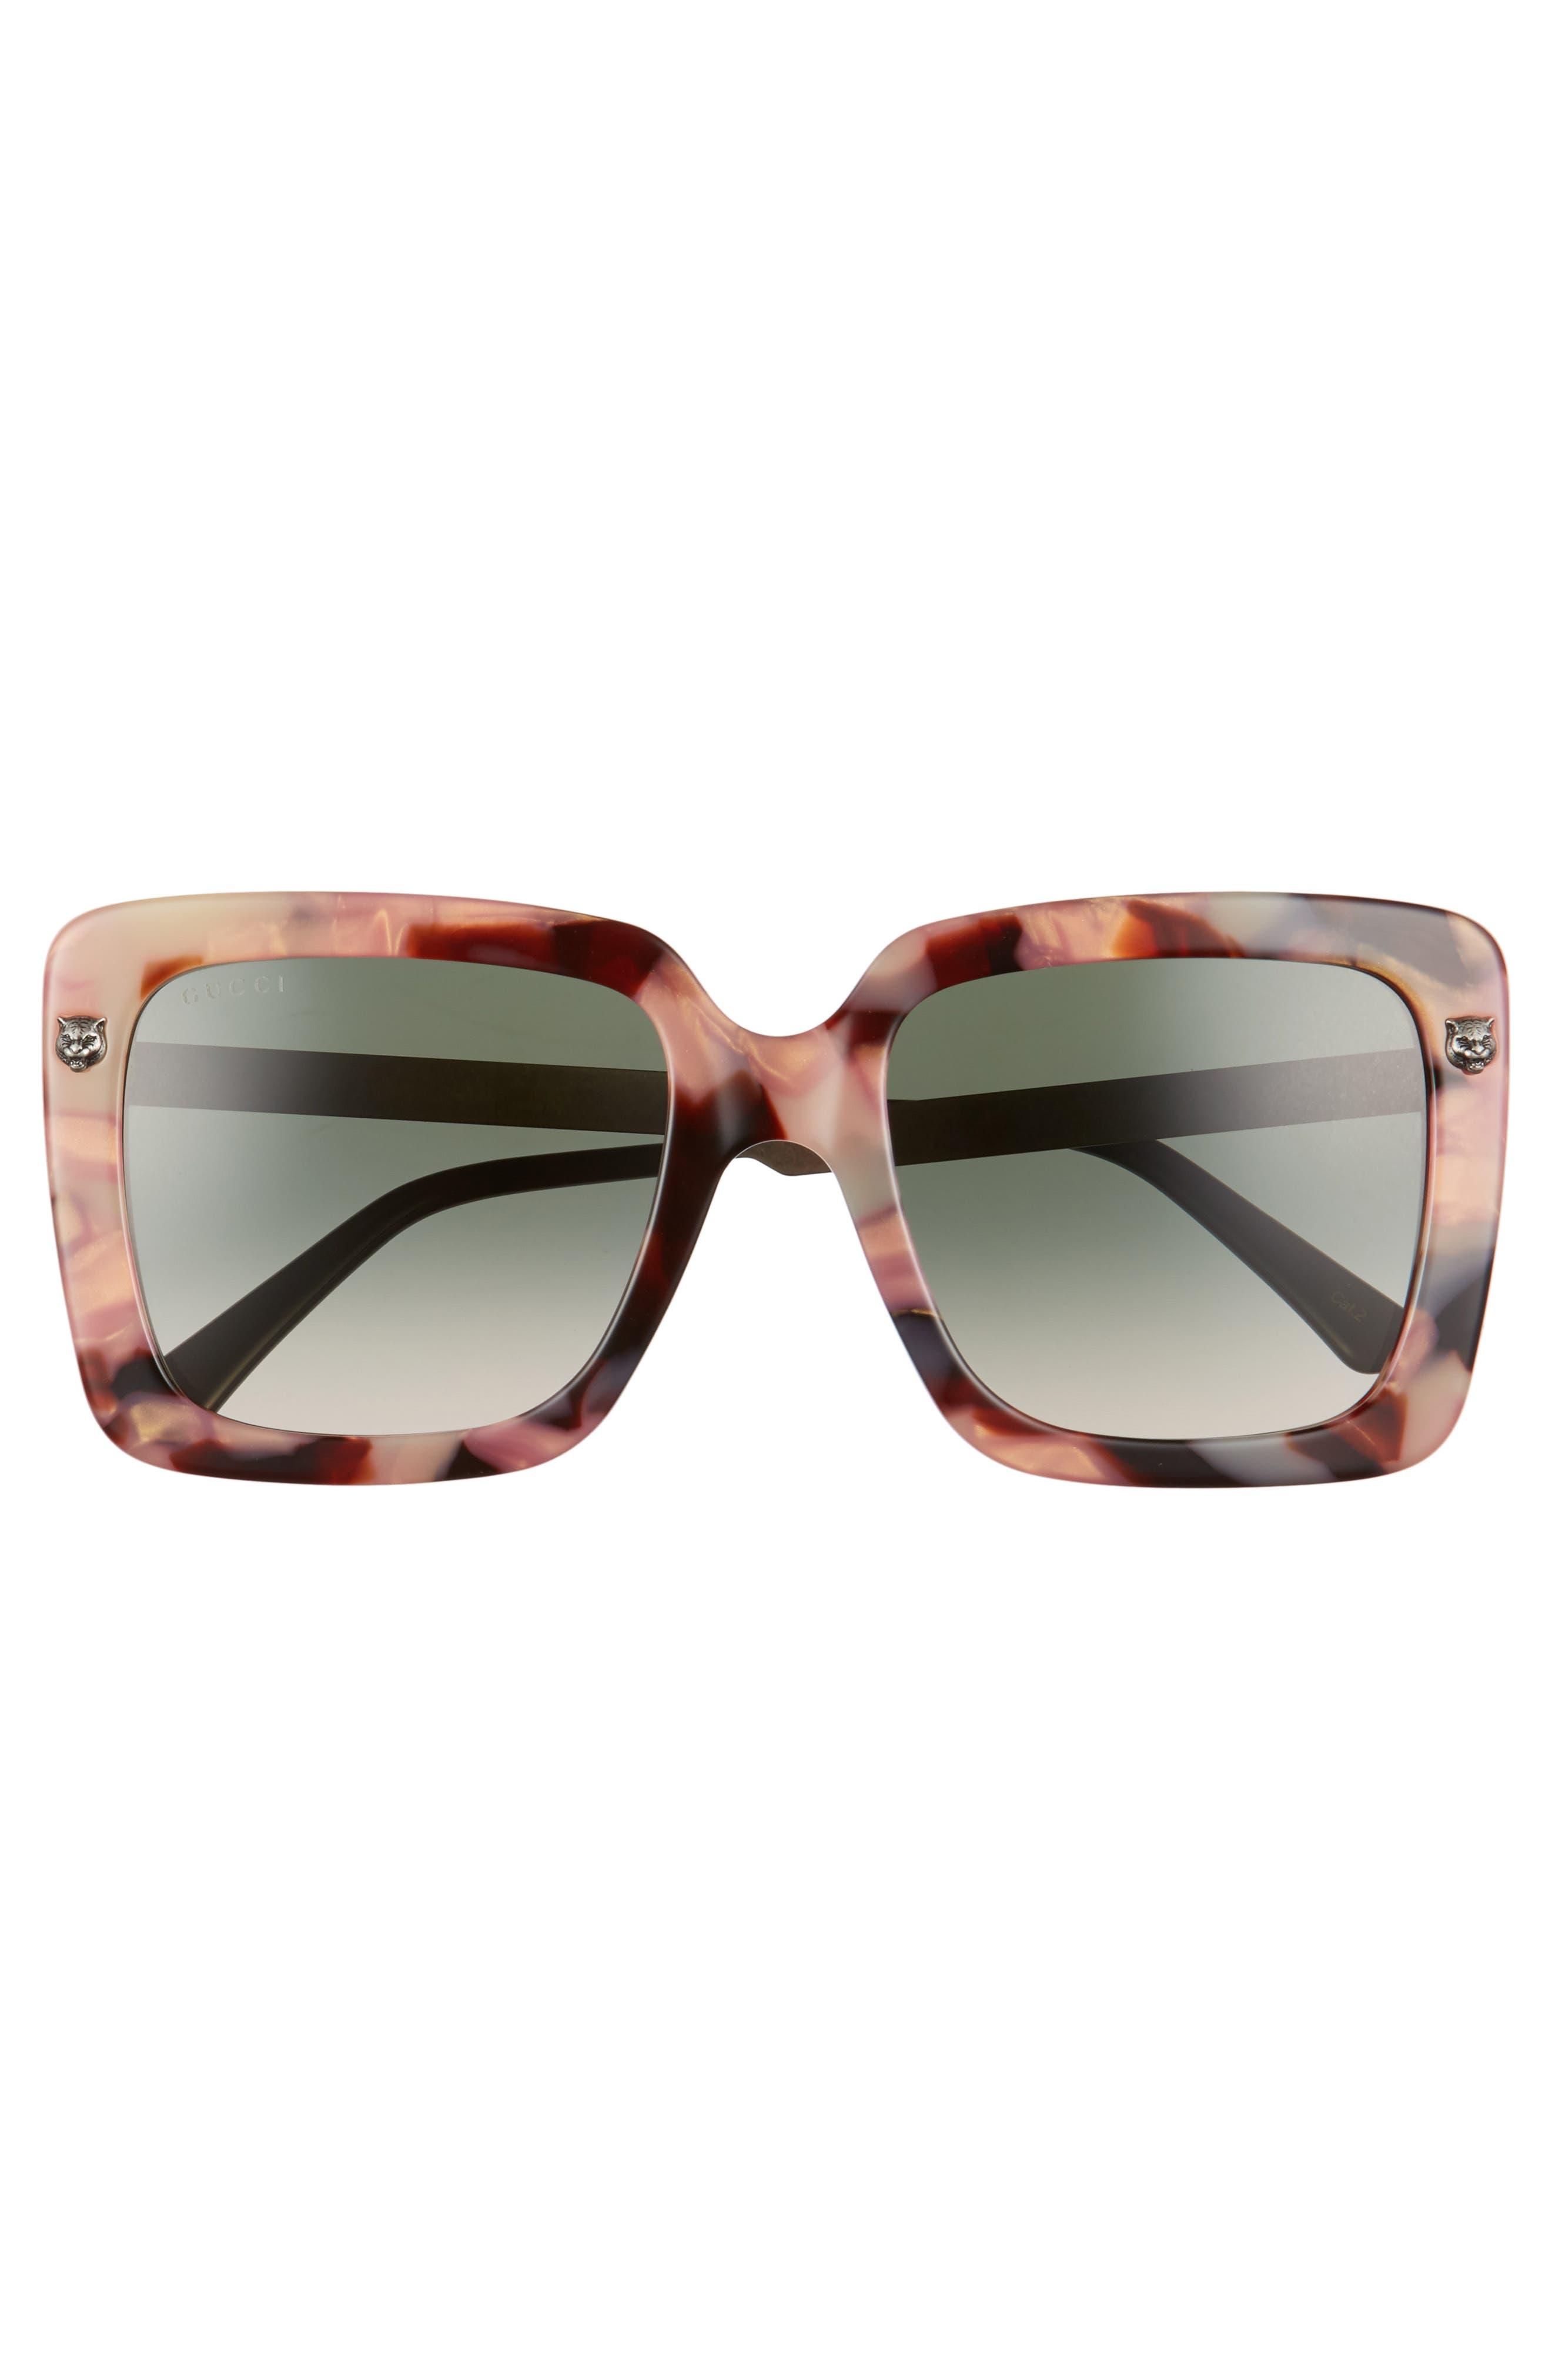 53mm Square Sunglasses,                             Alternate thumbnail 3, color,                             HAVANA